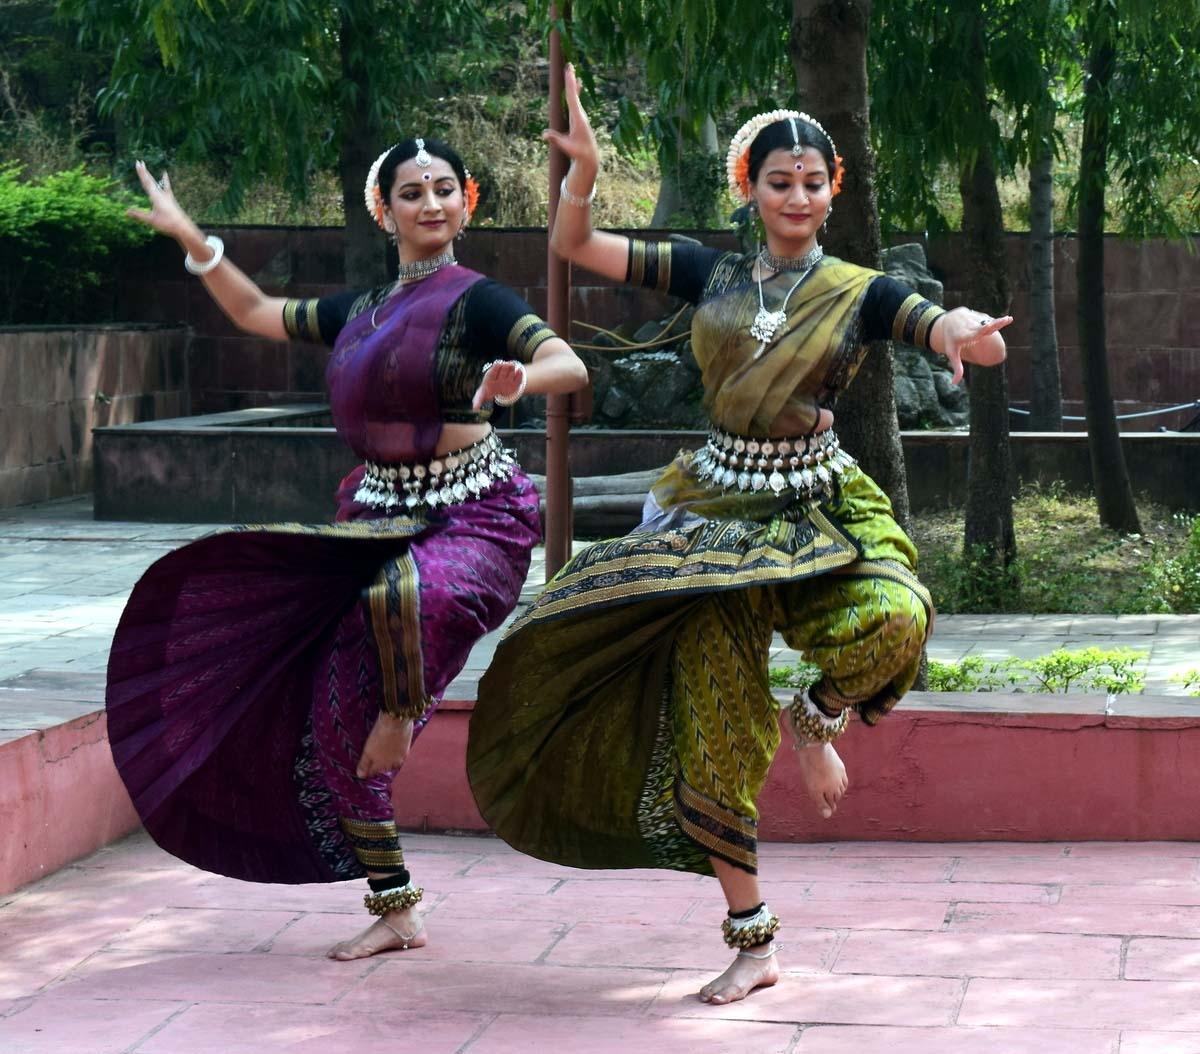 Bhopal: 'Atulya Bharat Madhya Pradesh' kicks off with folk and classical dance at IGRMS